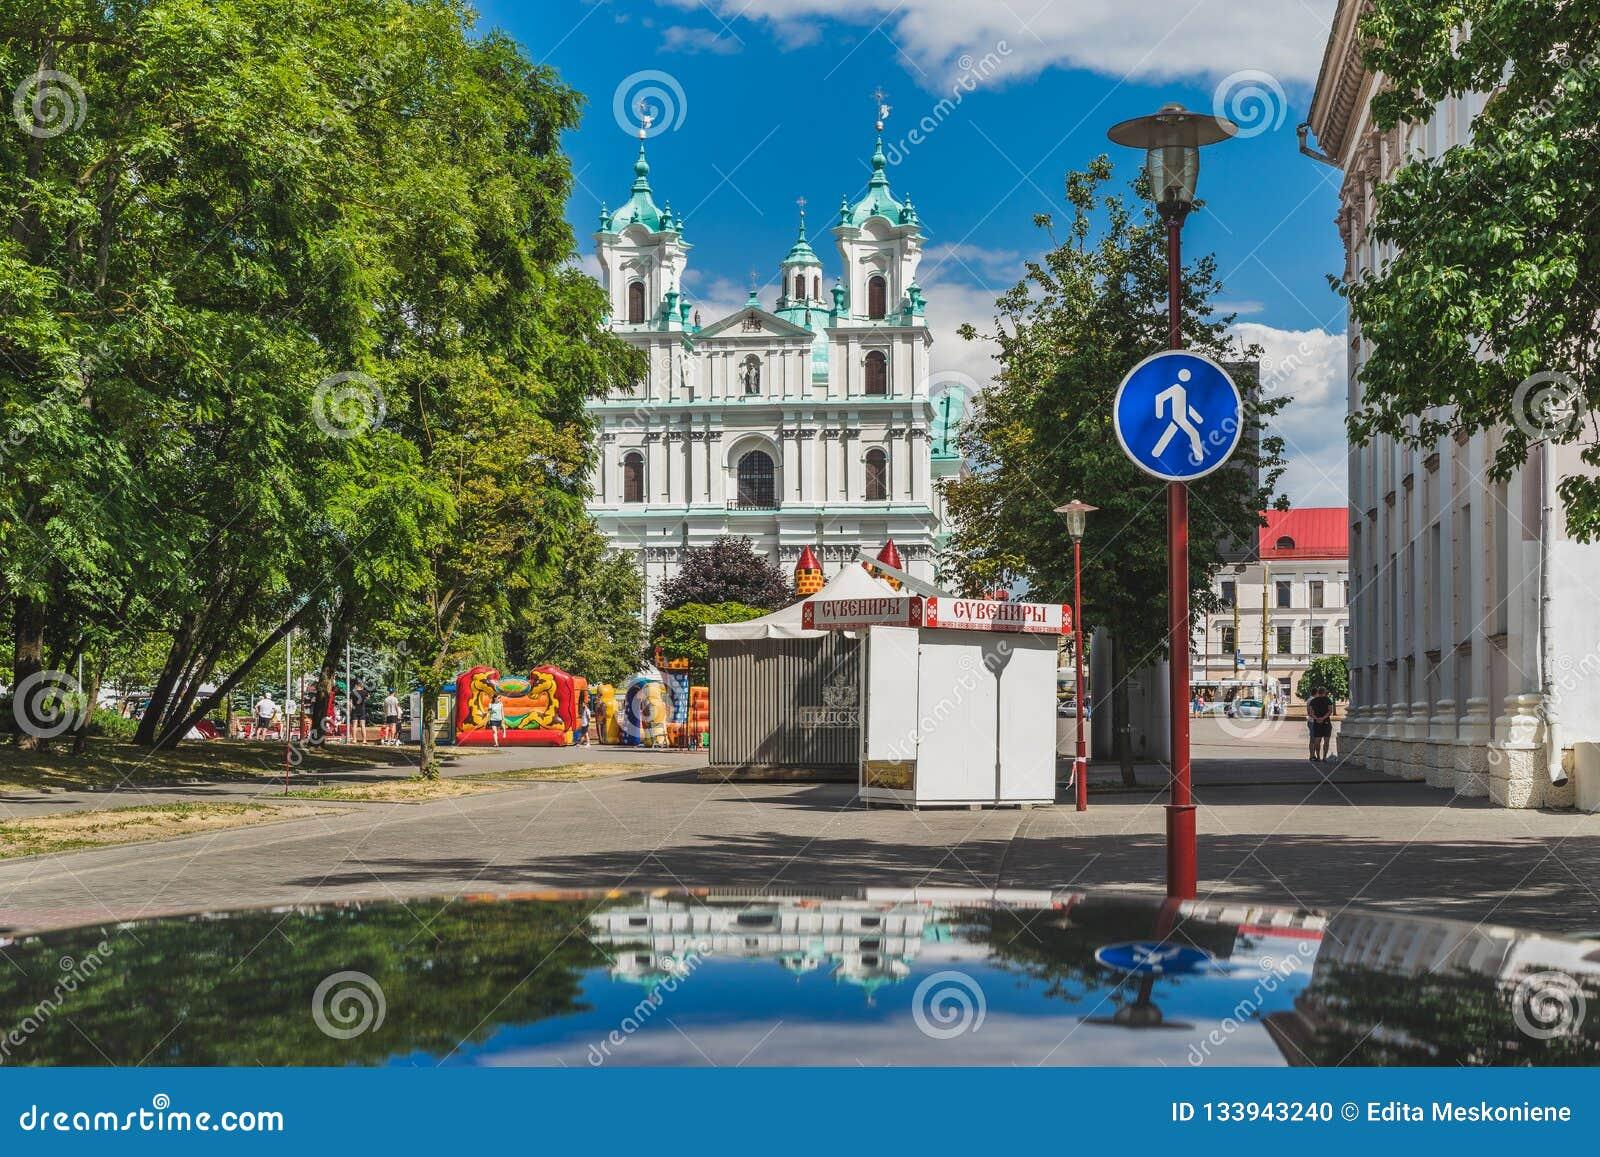 Church of Saint Francis Xavier in Grodno